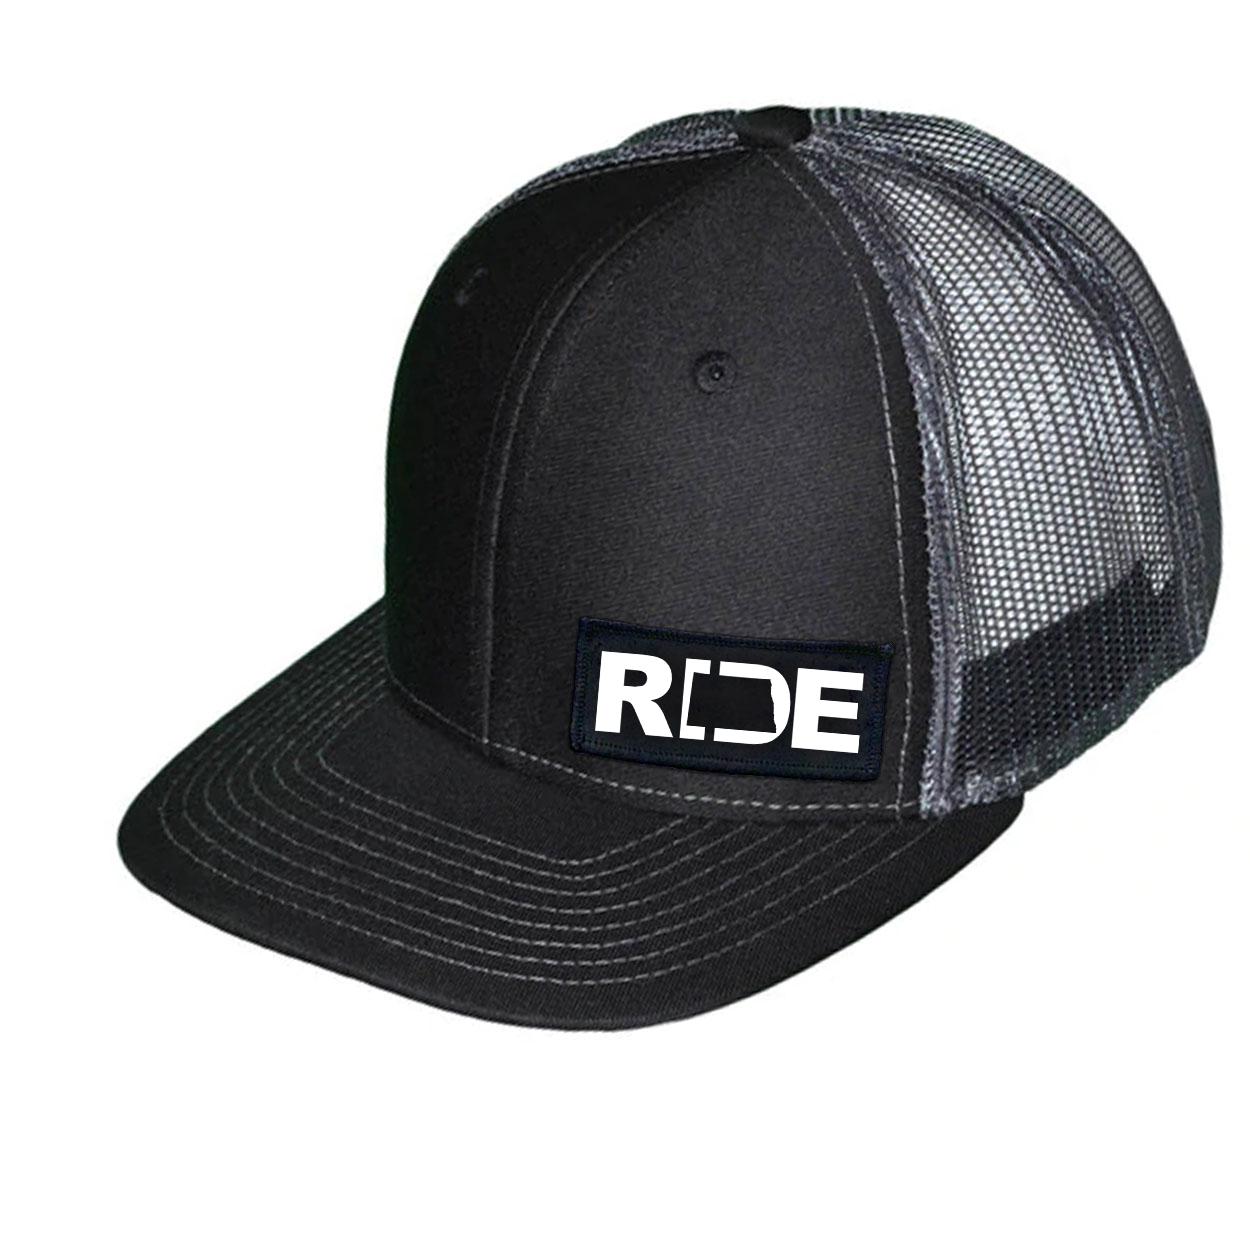 Ride North Dakota Night Out Woven Patch Snapback Trucker Hat Black/Dark Gray (White Logo)